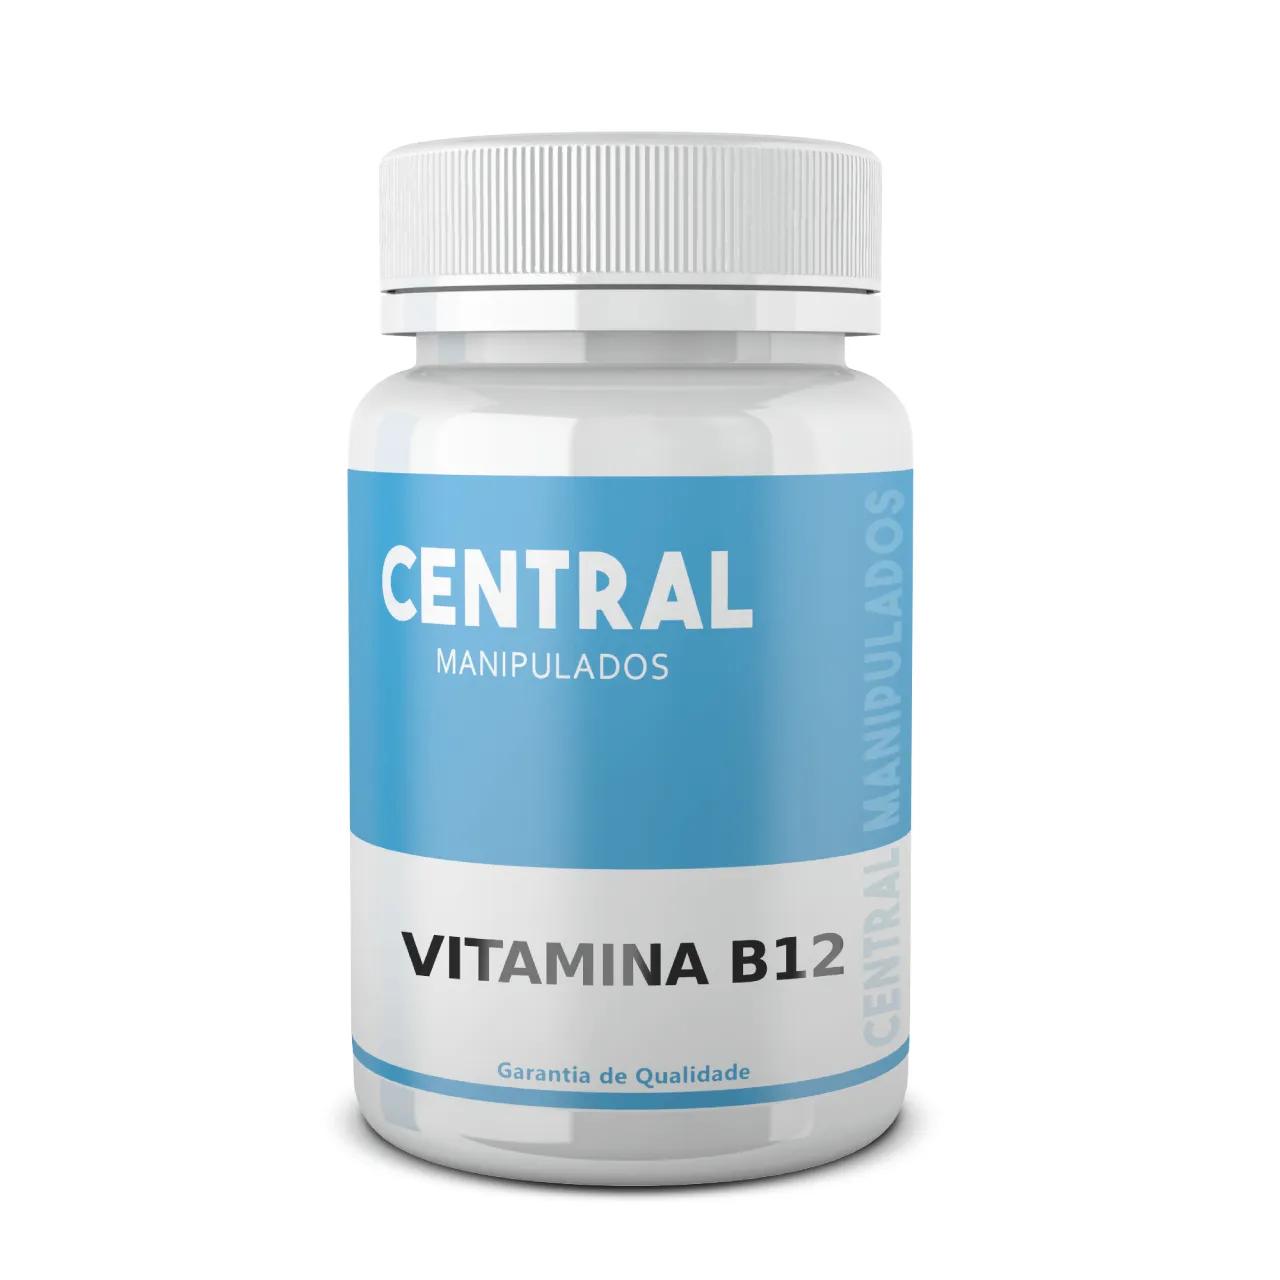 Vitamina B12 1mg - 30 Comprimidos Sublingual  (Tapiocaps)